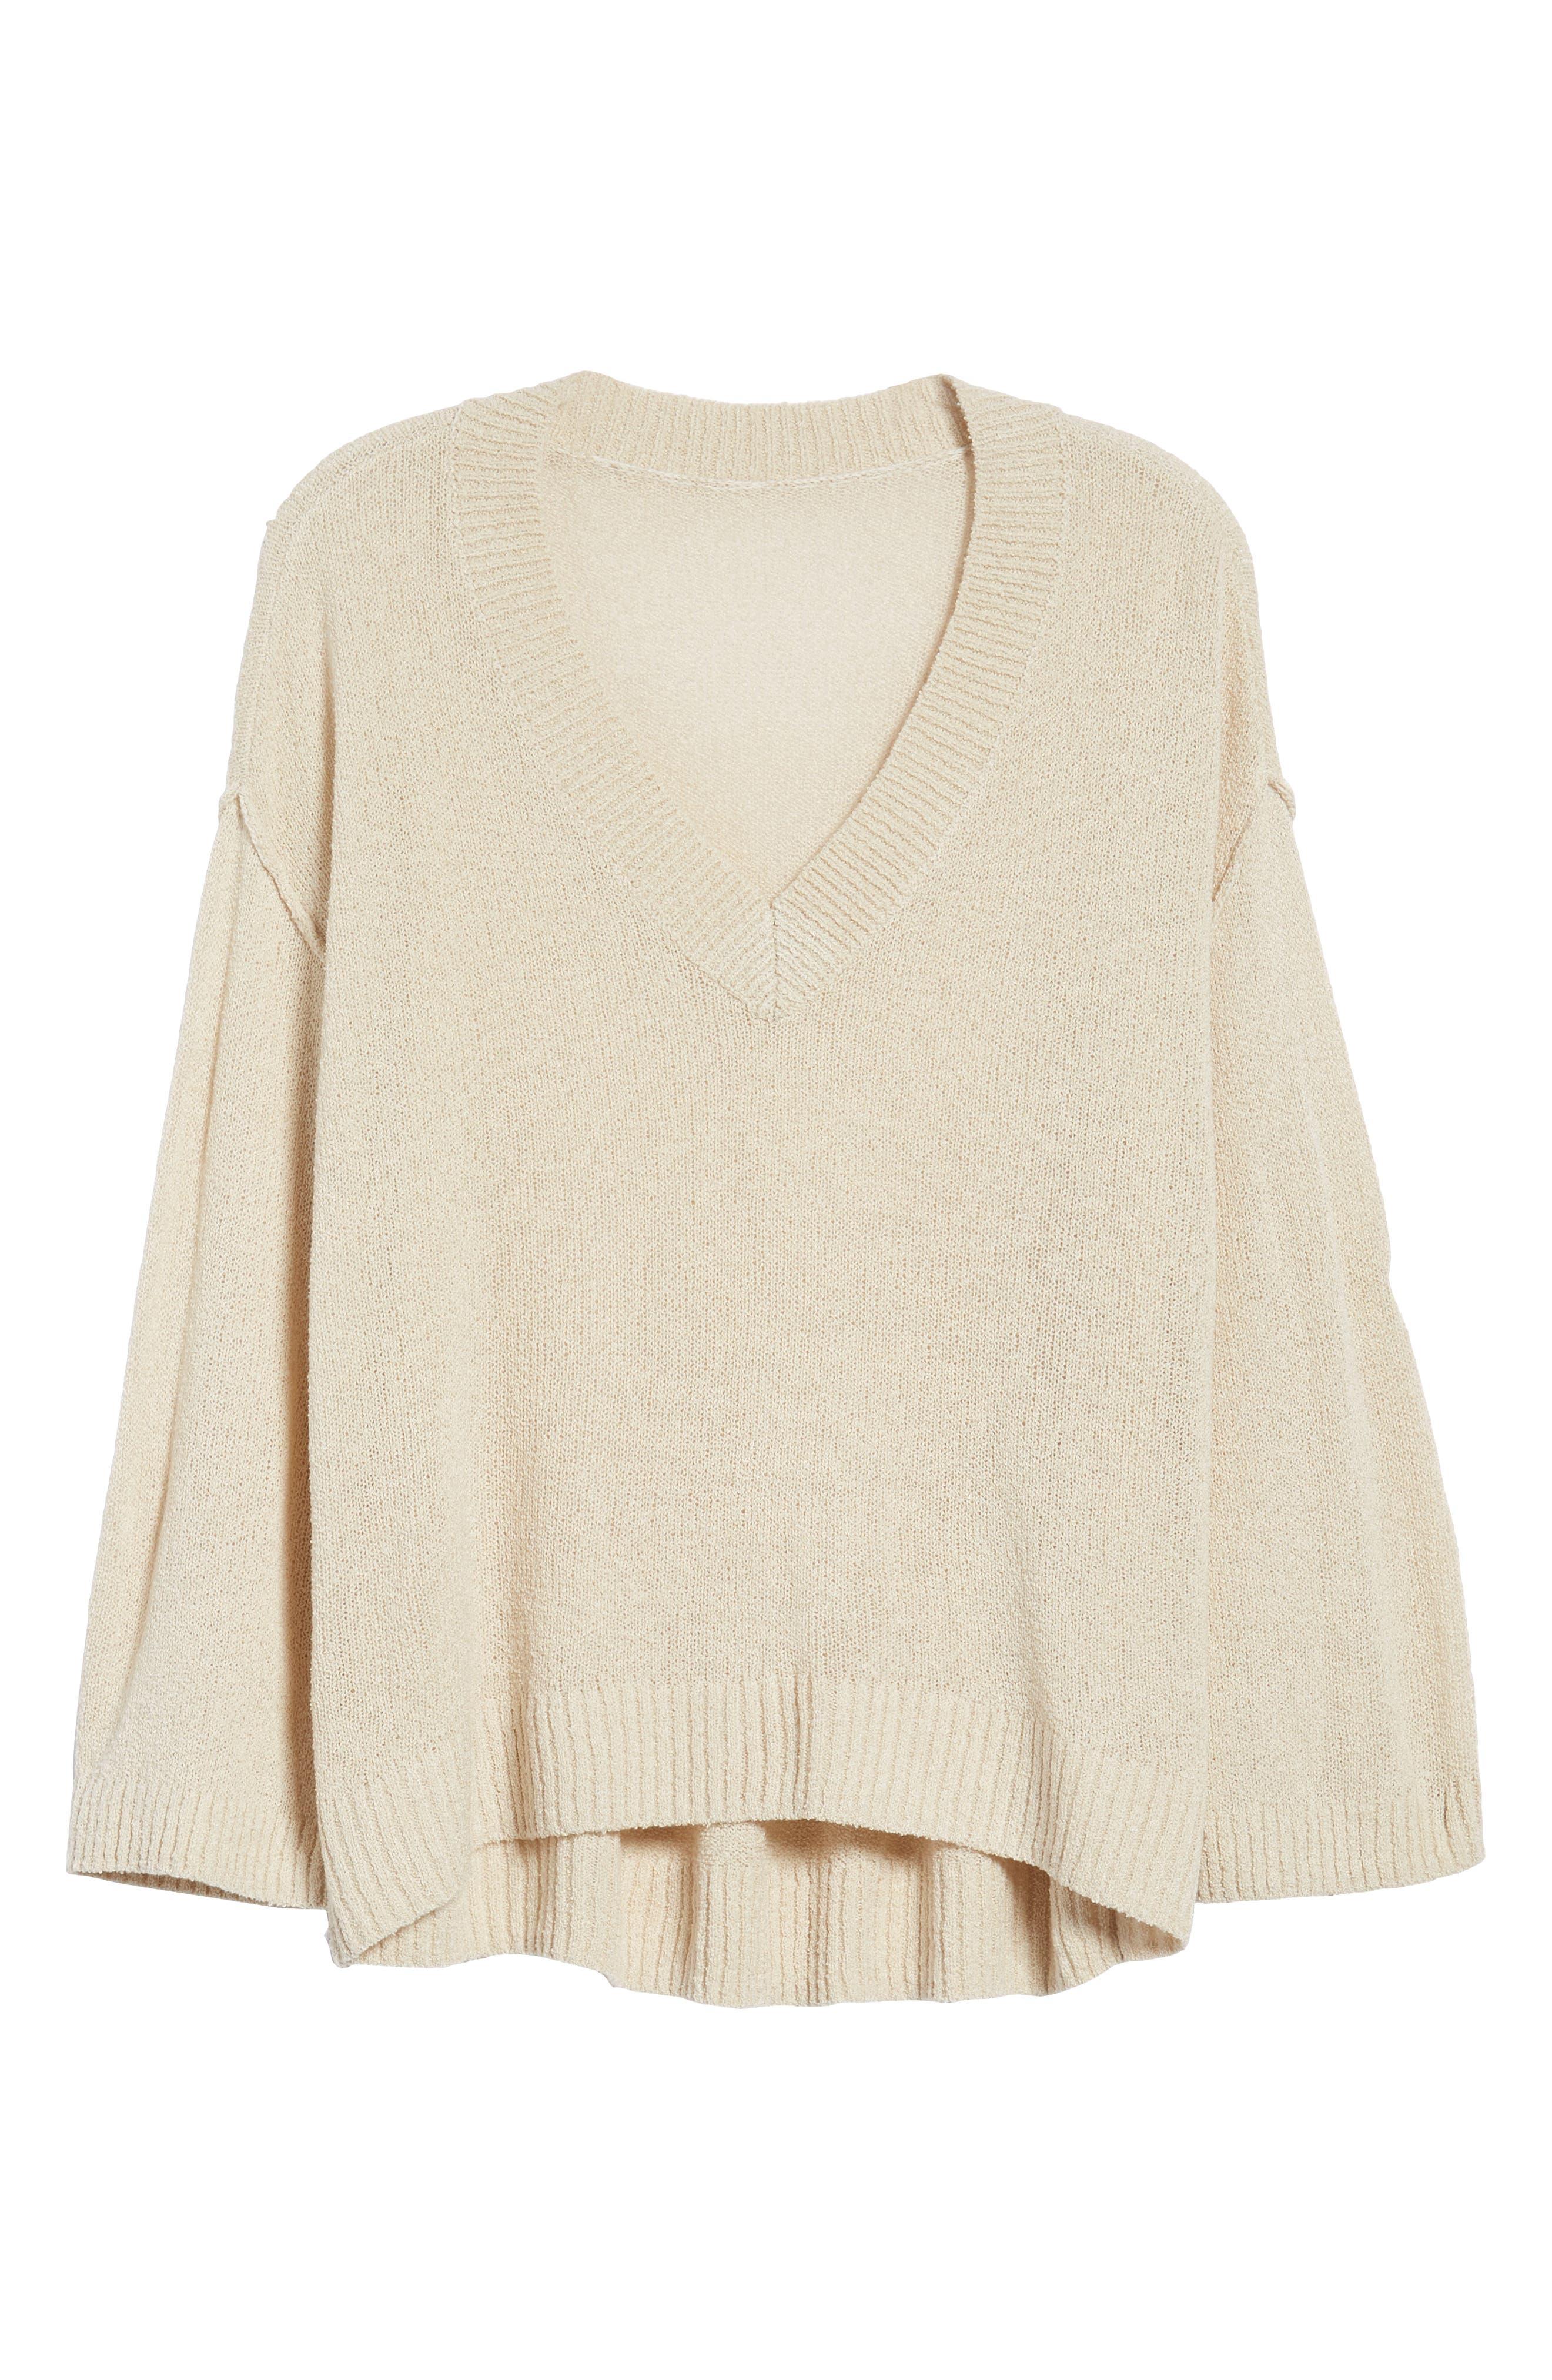 Exposed Seam Sweater,                             Alternate thumbnail 6, color,                             Beige Birch